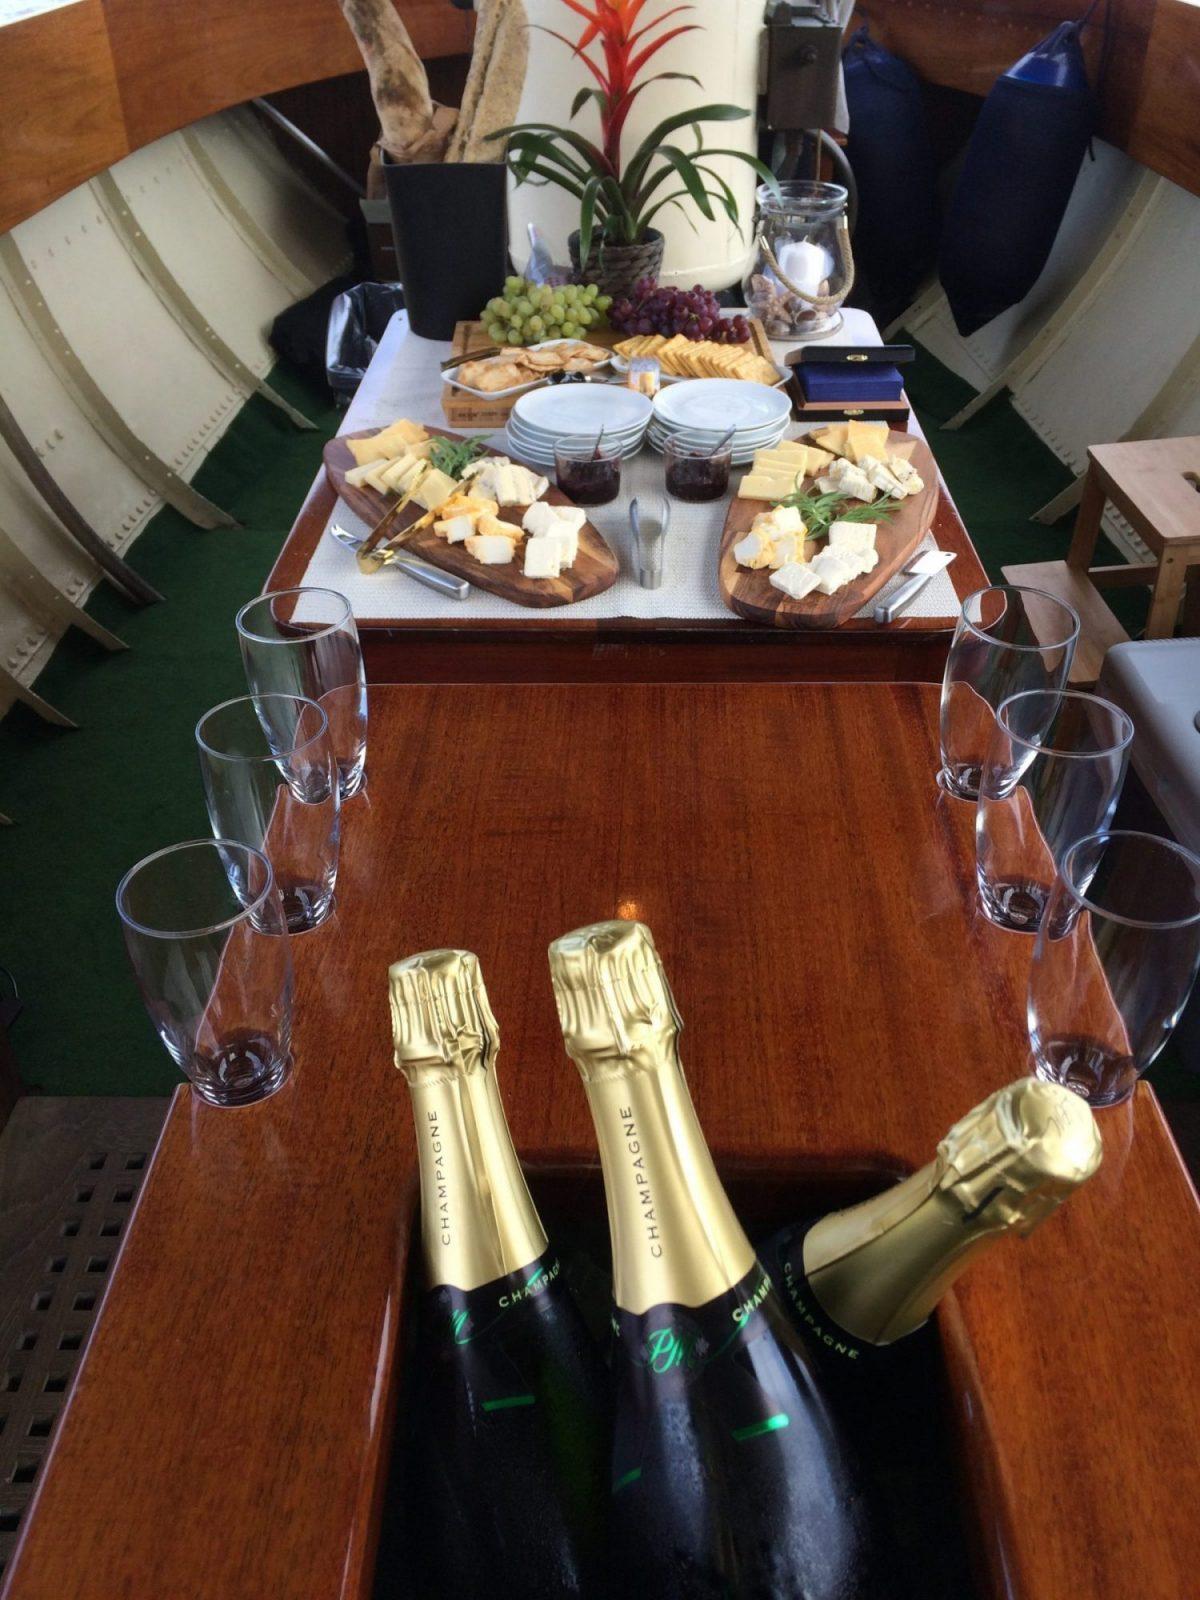 http://www.nobilischarter.se/wp-content/uploads/2017/06/Fartygets-Champagne-e1498564172380.jpg